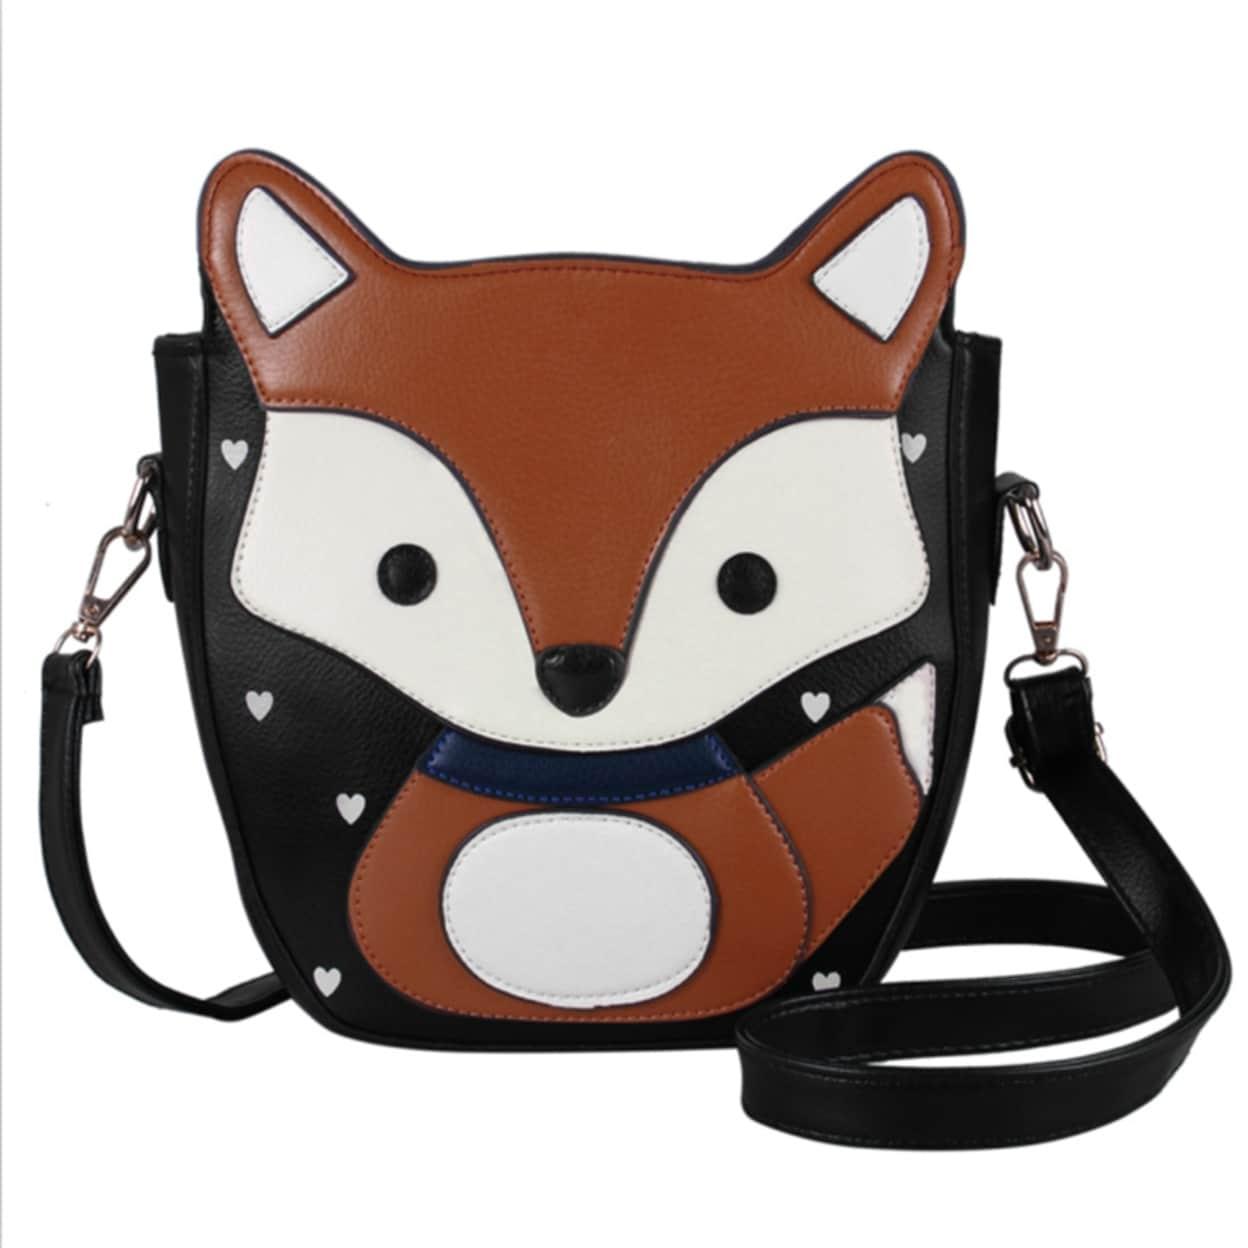 Cartoon Fox Messenger Bag Free Shipping On Orders Over 45 23487474